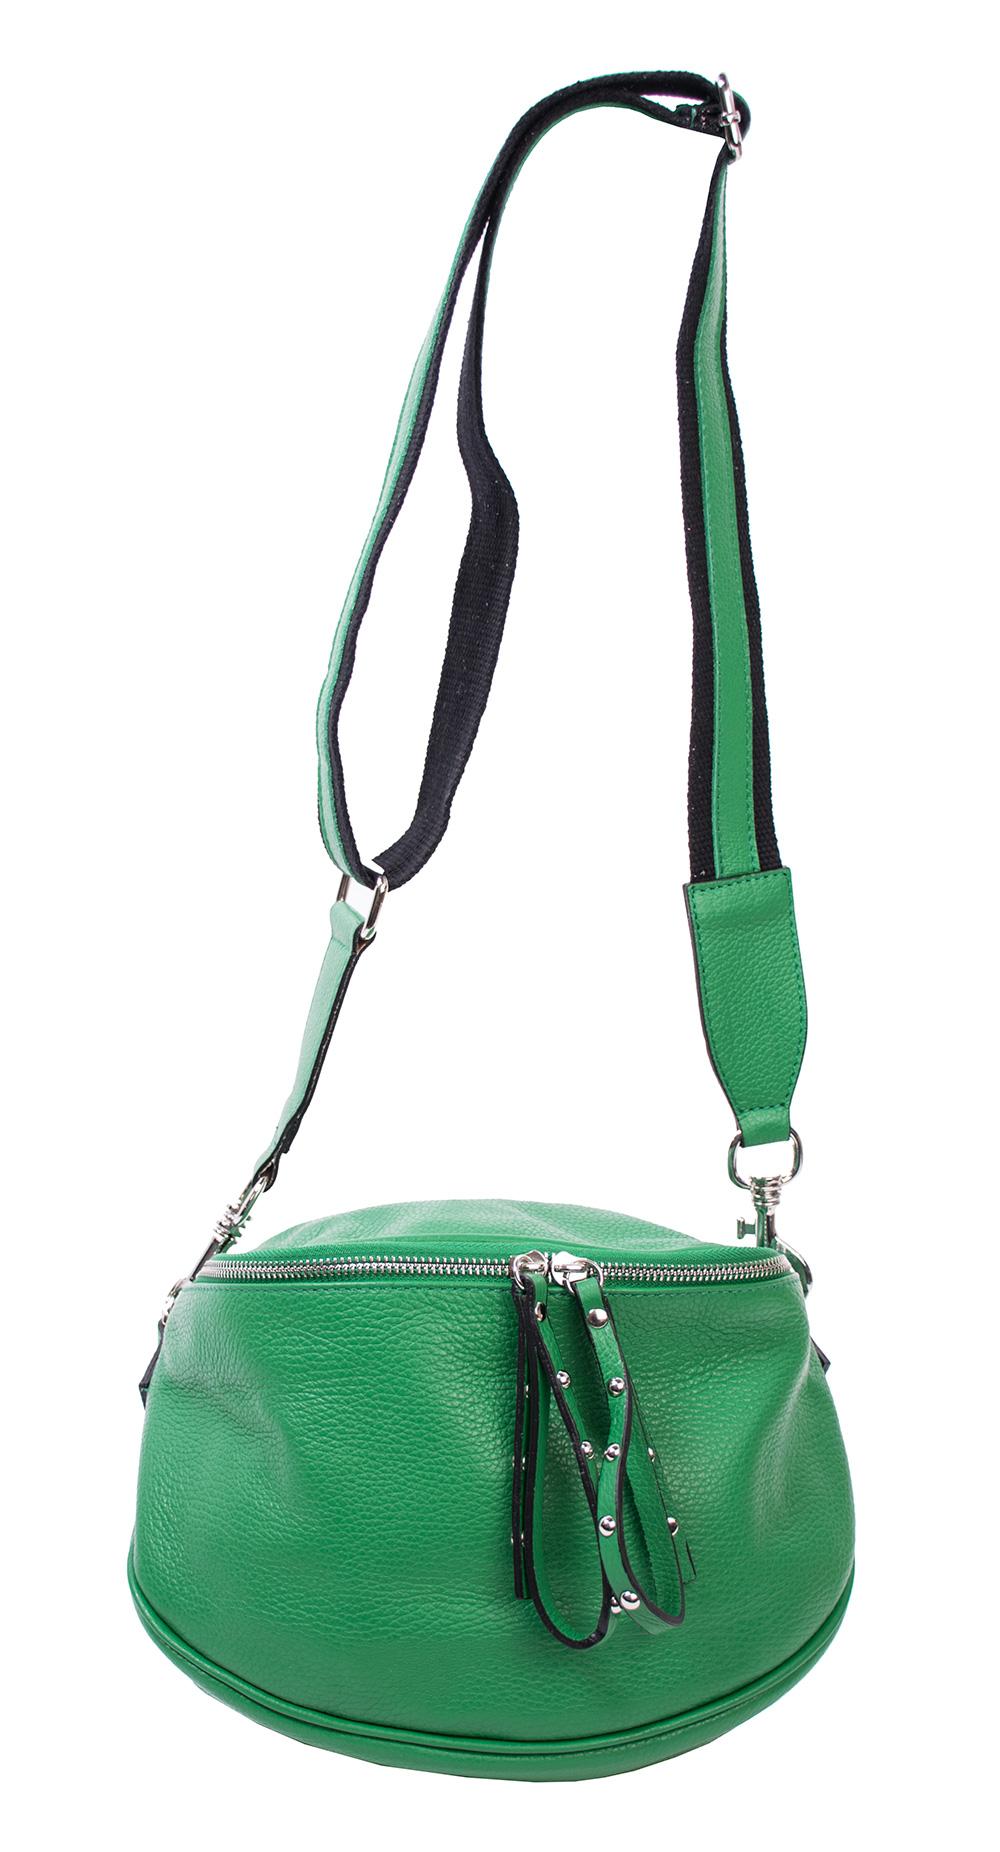 Bags and More Claire Zöld Női Bőr Oldaltáska